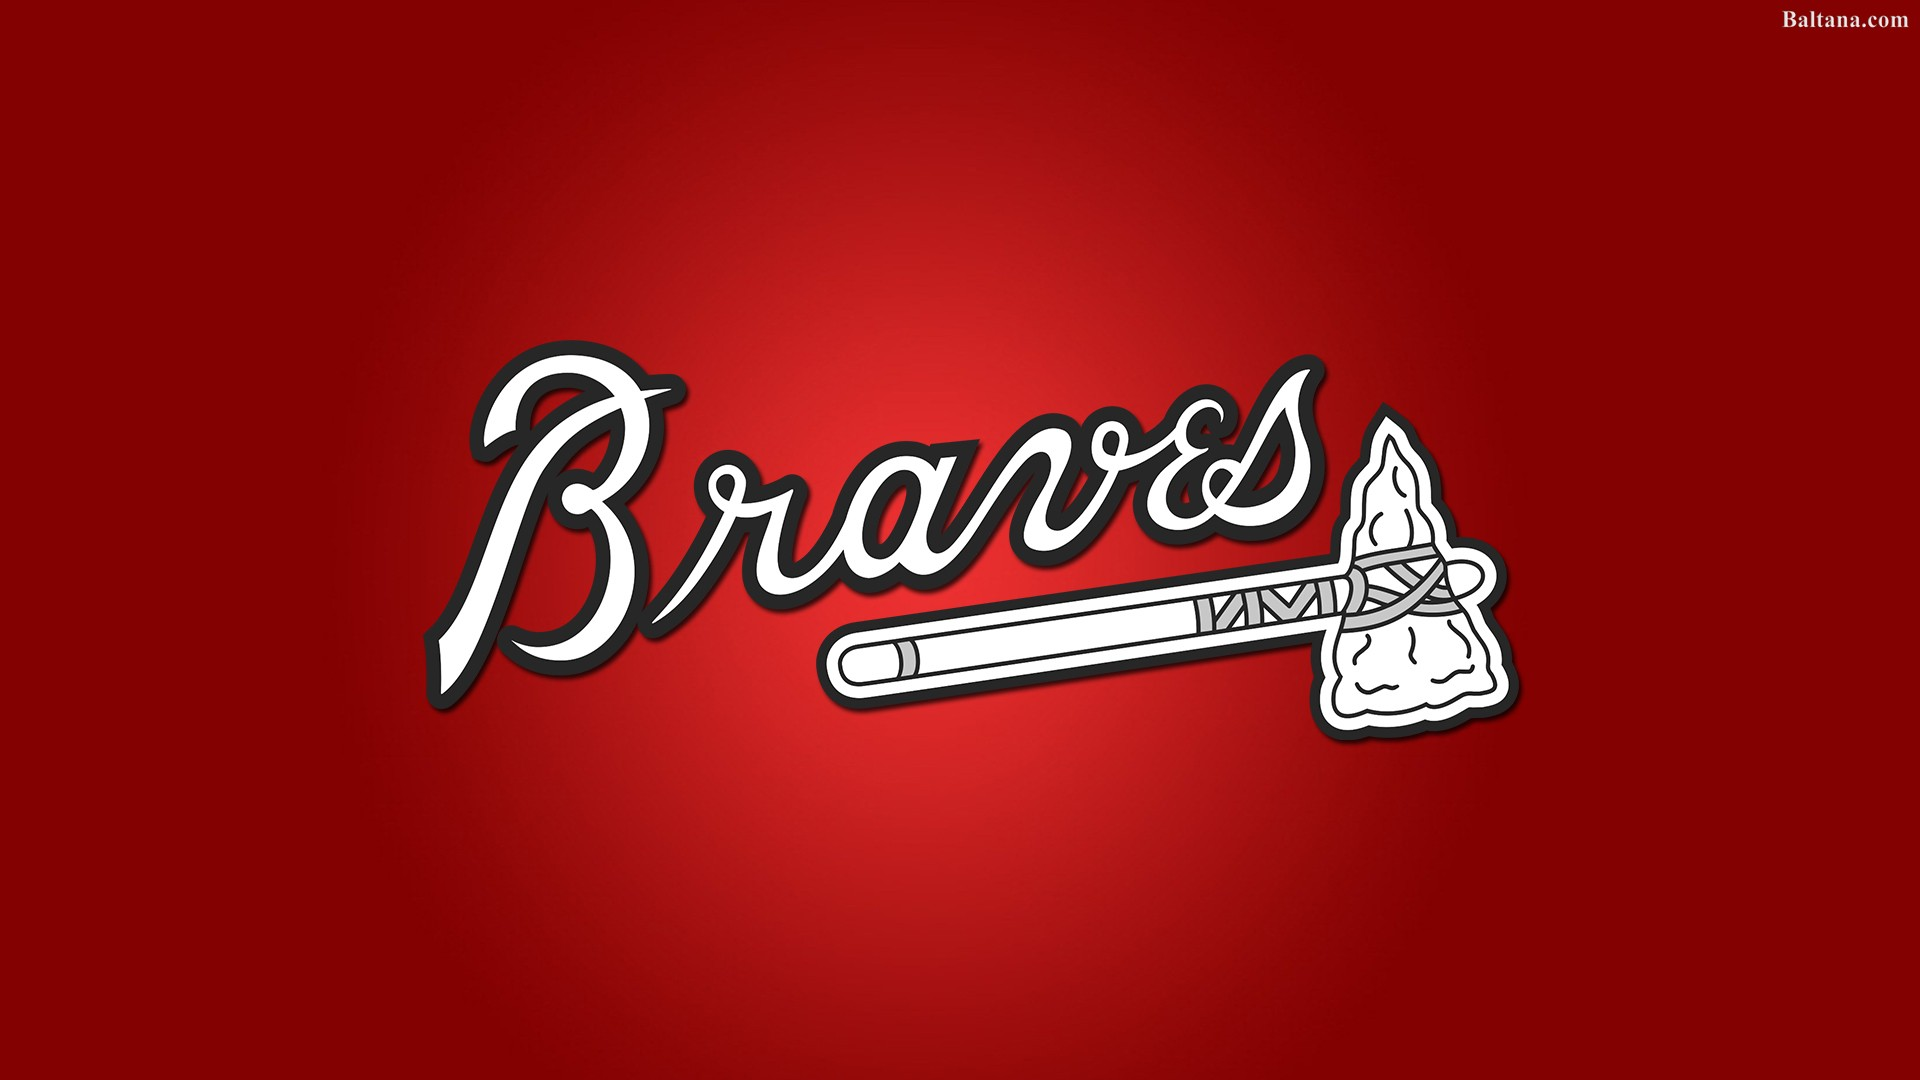 Atlanta Braves Desktop Wallpaper Posted By Ryan Anderson